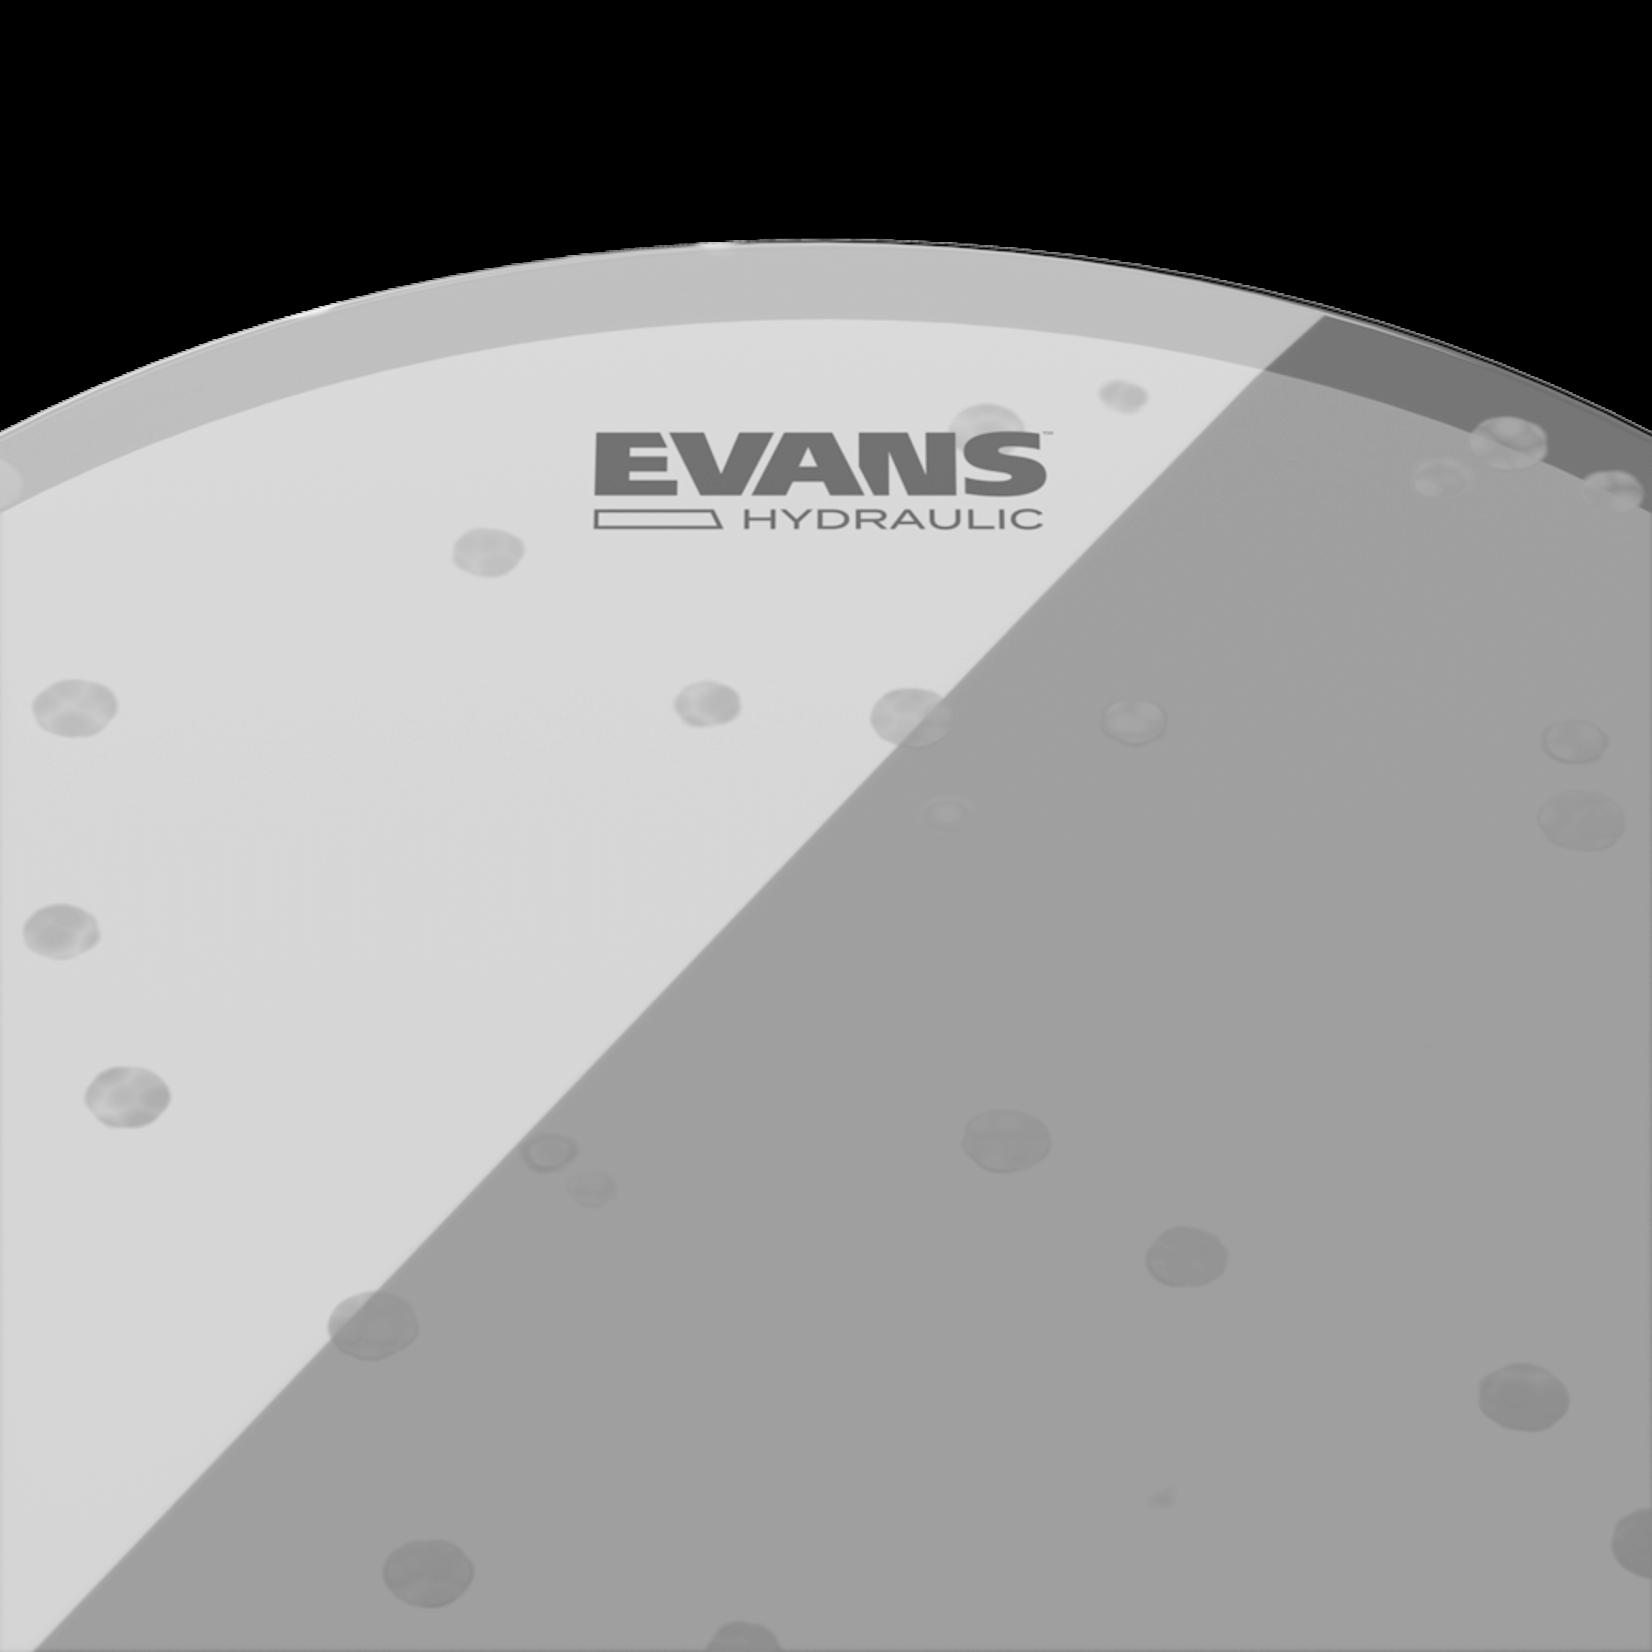 Evans EVANS HYDRAULIC GLASS